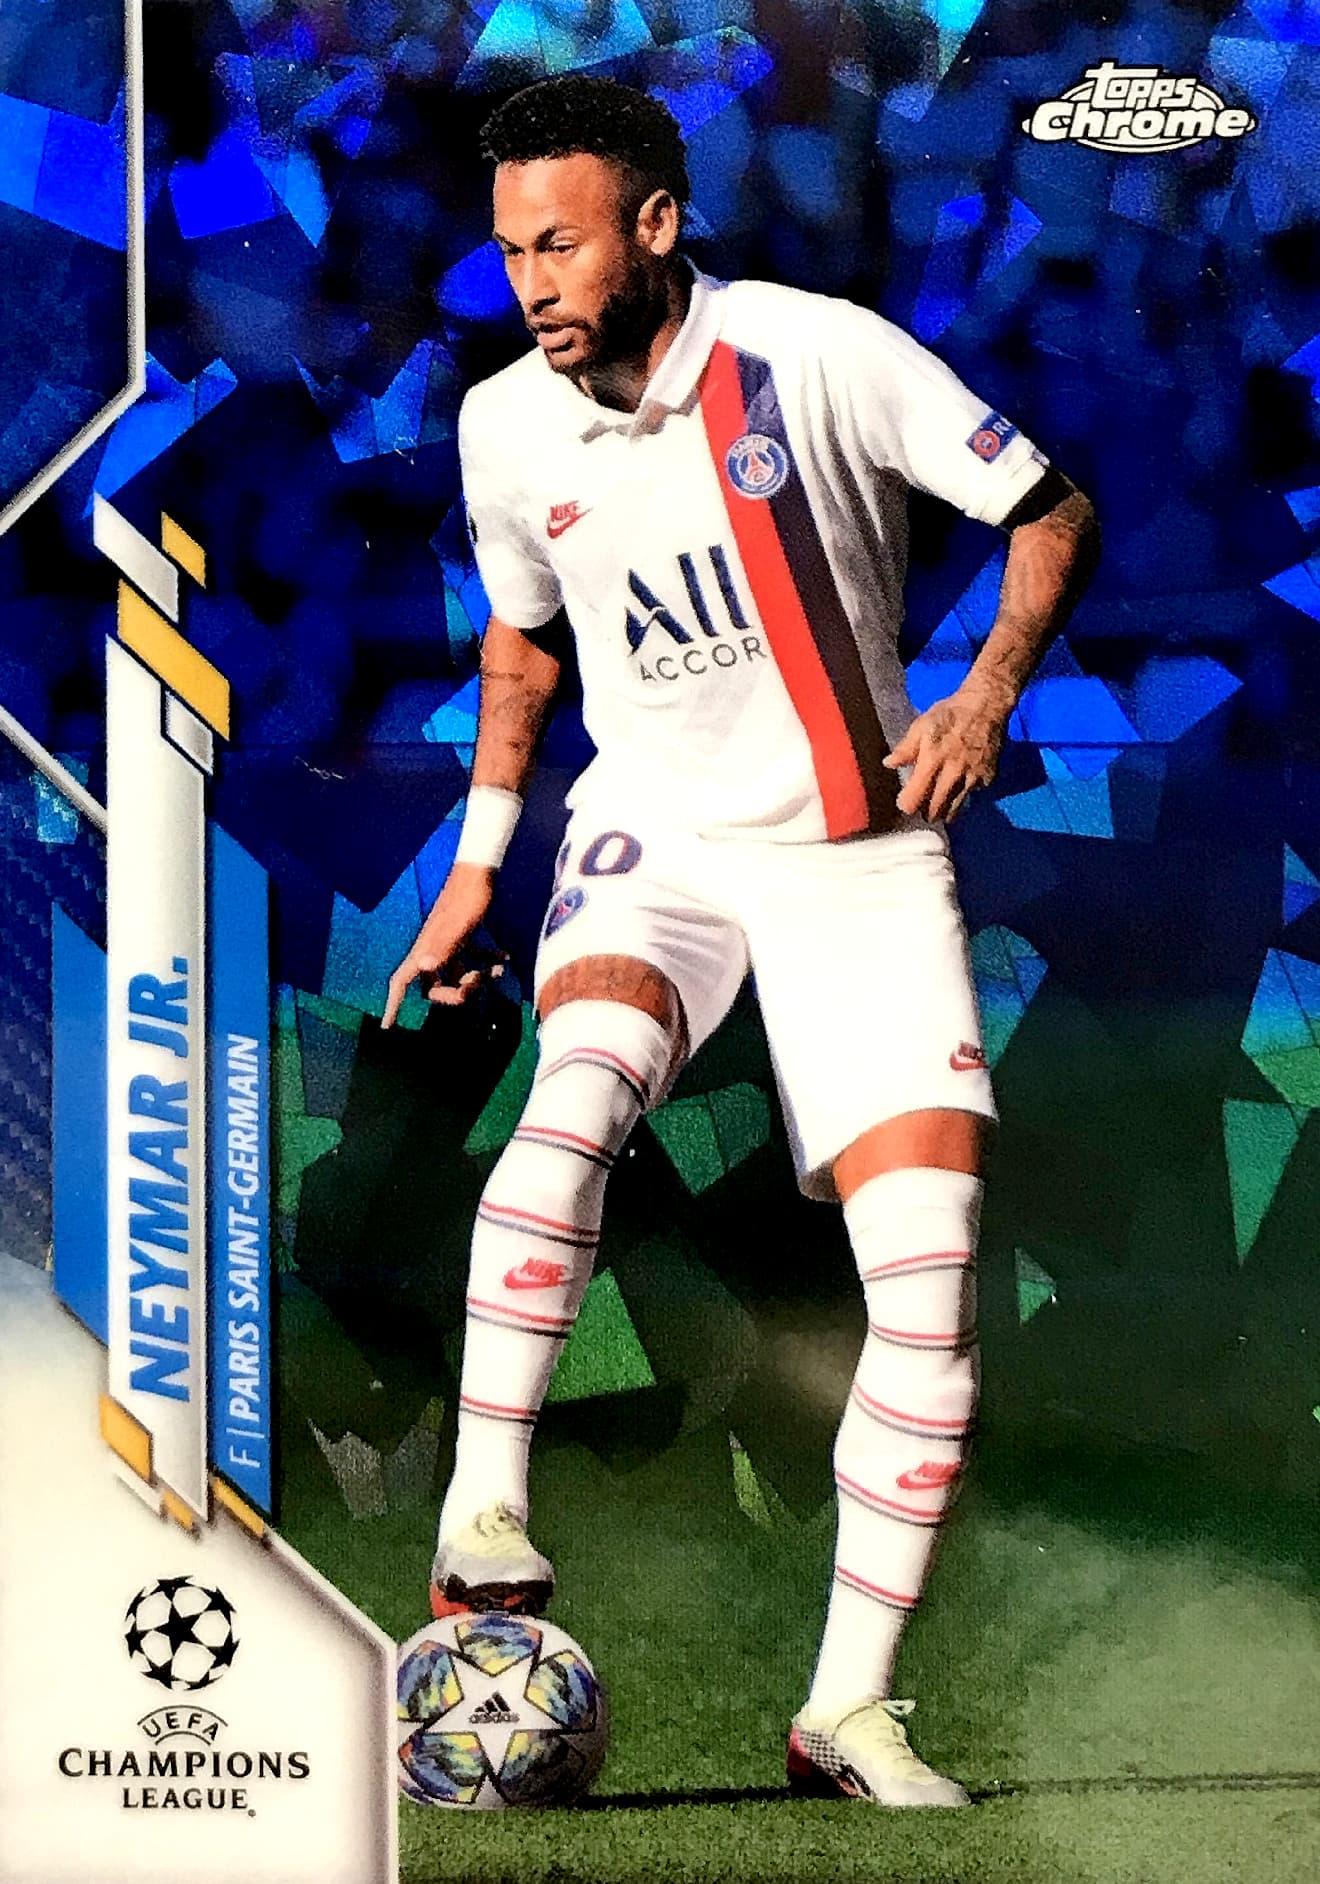 【quincy】2020 Topps 欧冠Chrome-蓝宝石版 球星卡 内马尔 Neymar Jr 巴黎圣日耳曼 Base 蓝 无编 NO.95 普卡